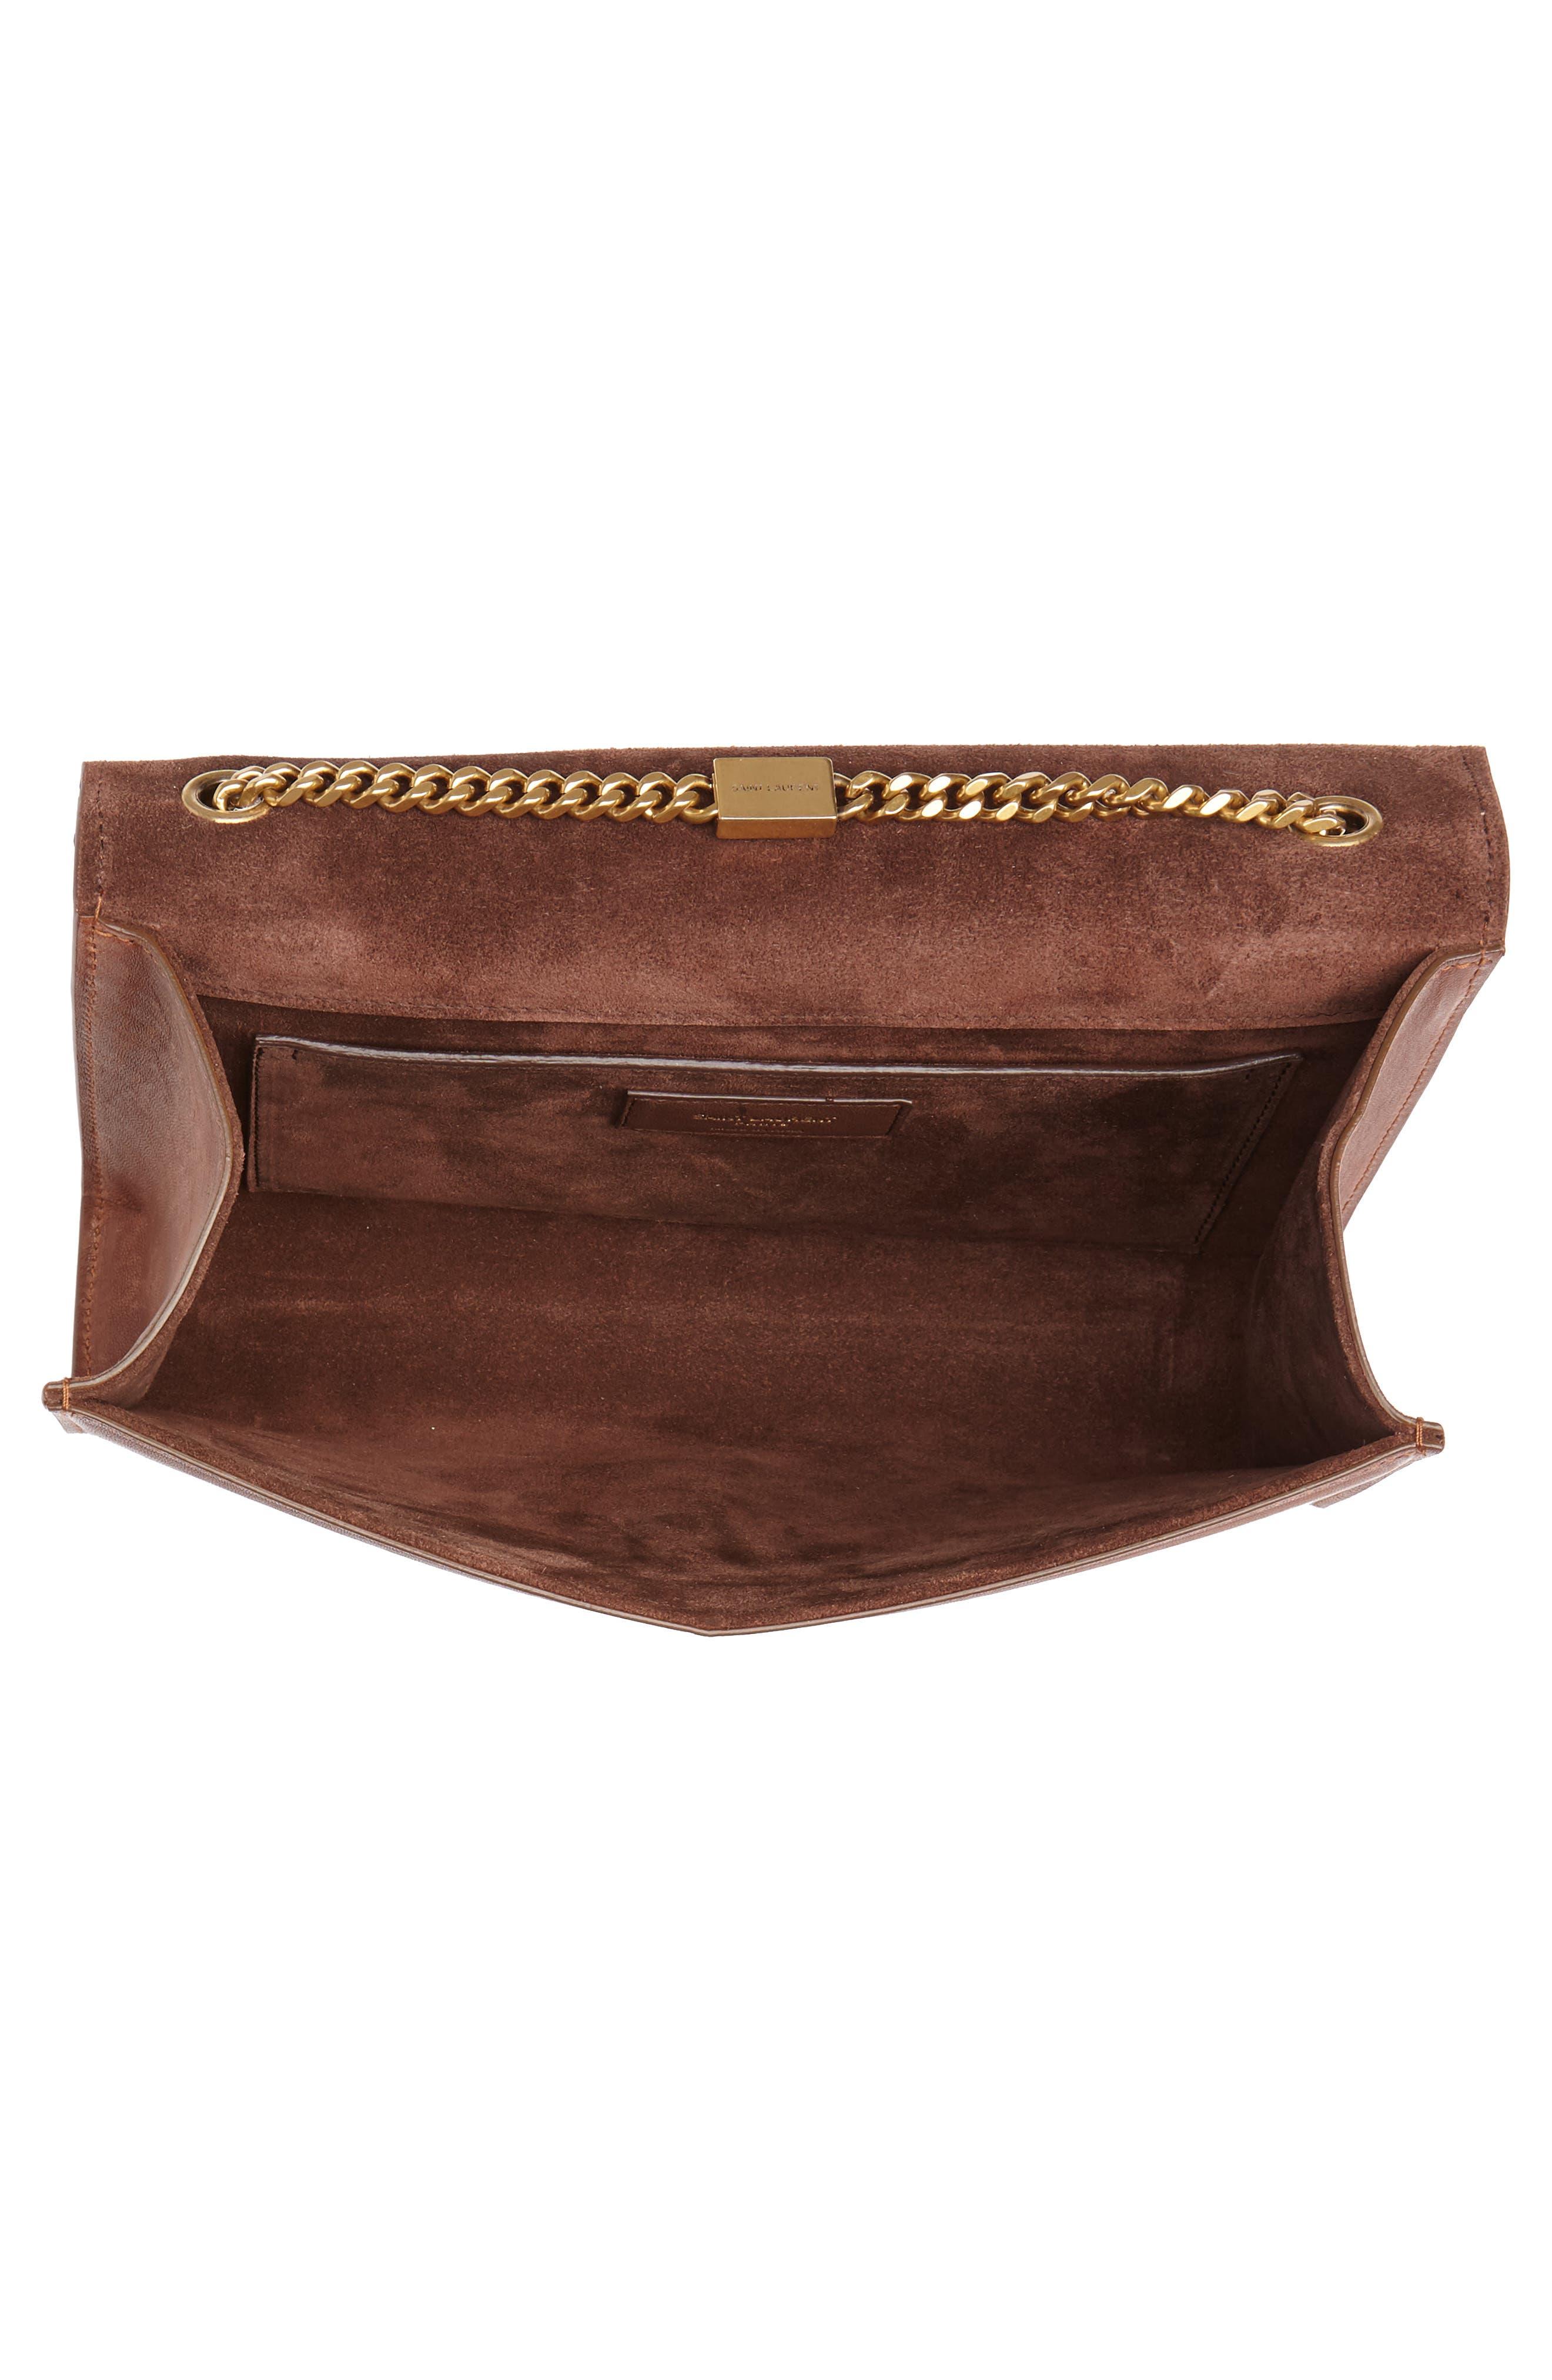 Medium Kate Studded Leather Crossbody Bag,                             Alternate thumbnail 4, color,                             BROWN MULTI